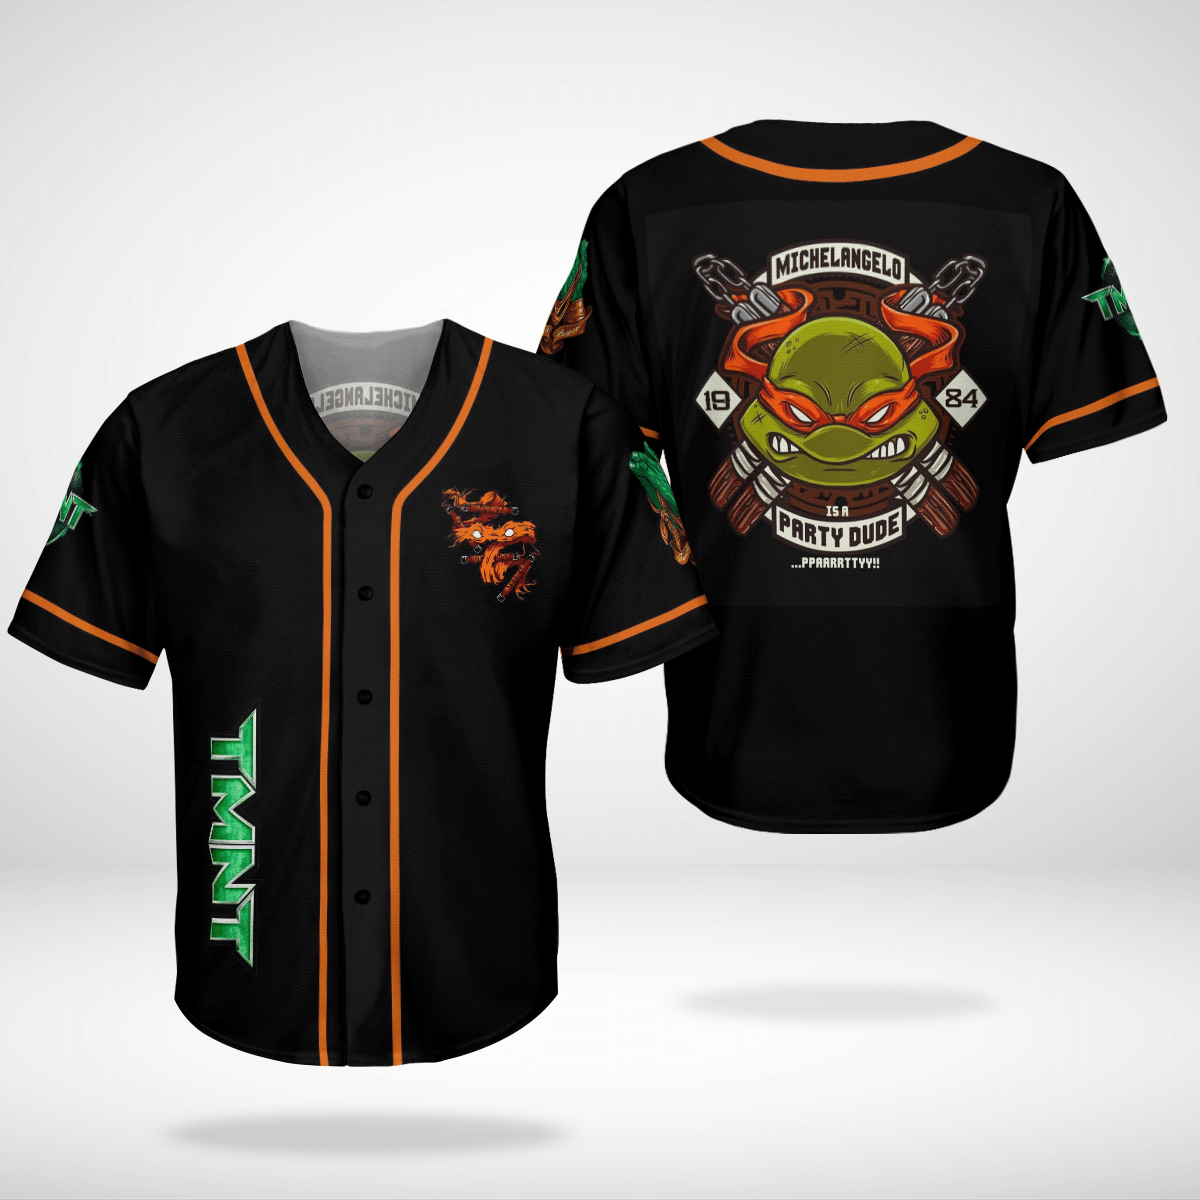 Michelangelo TMNT Ninja Turtles baseball Jersey shirt